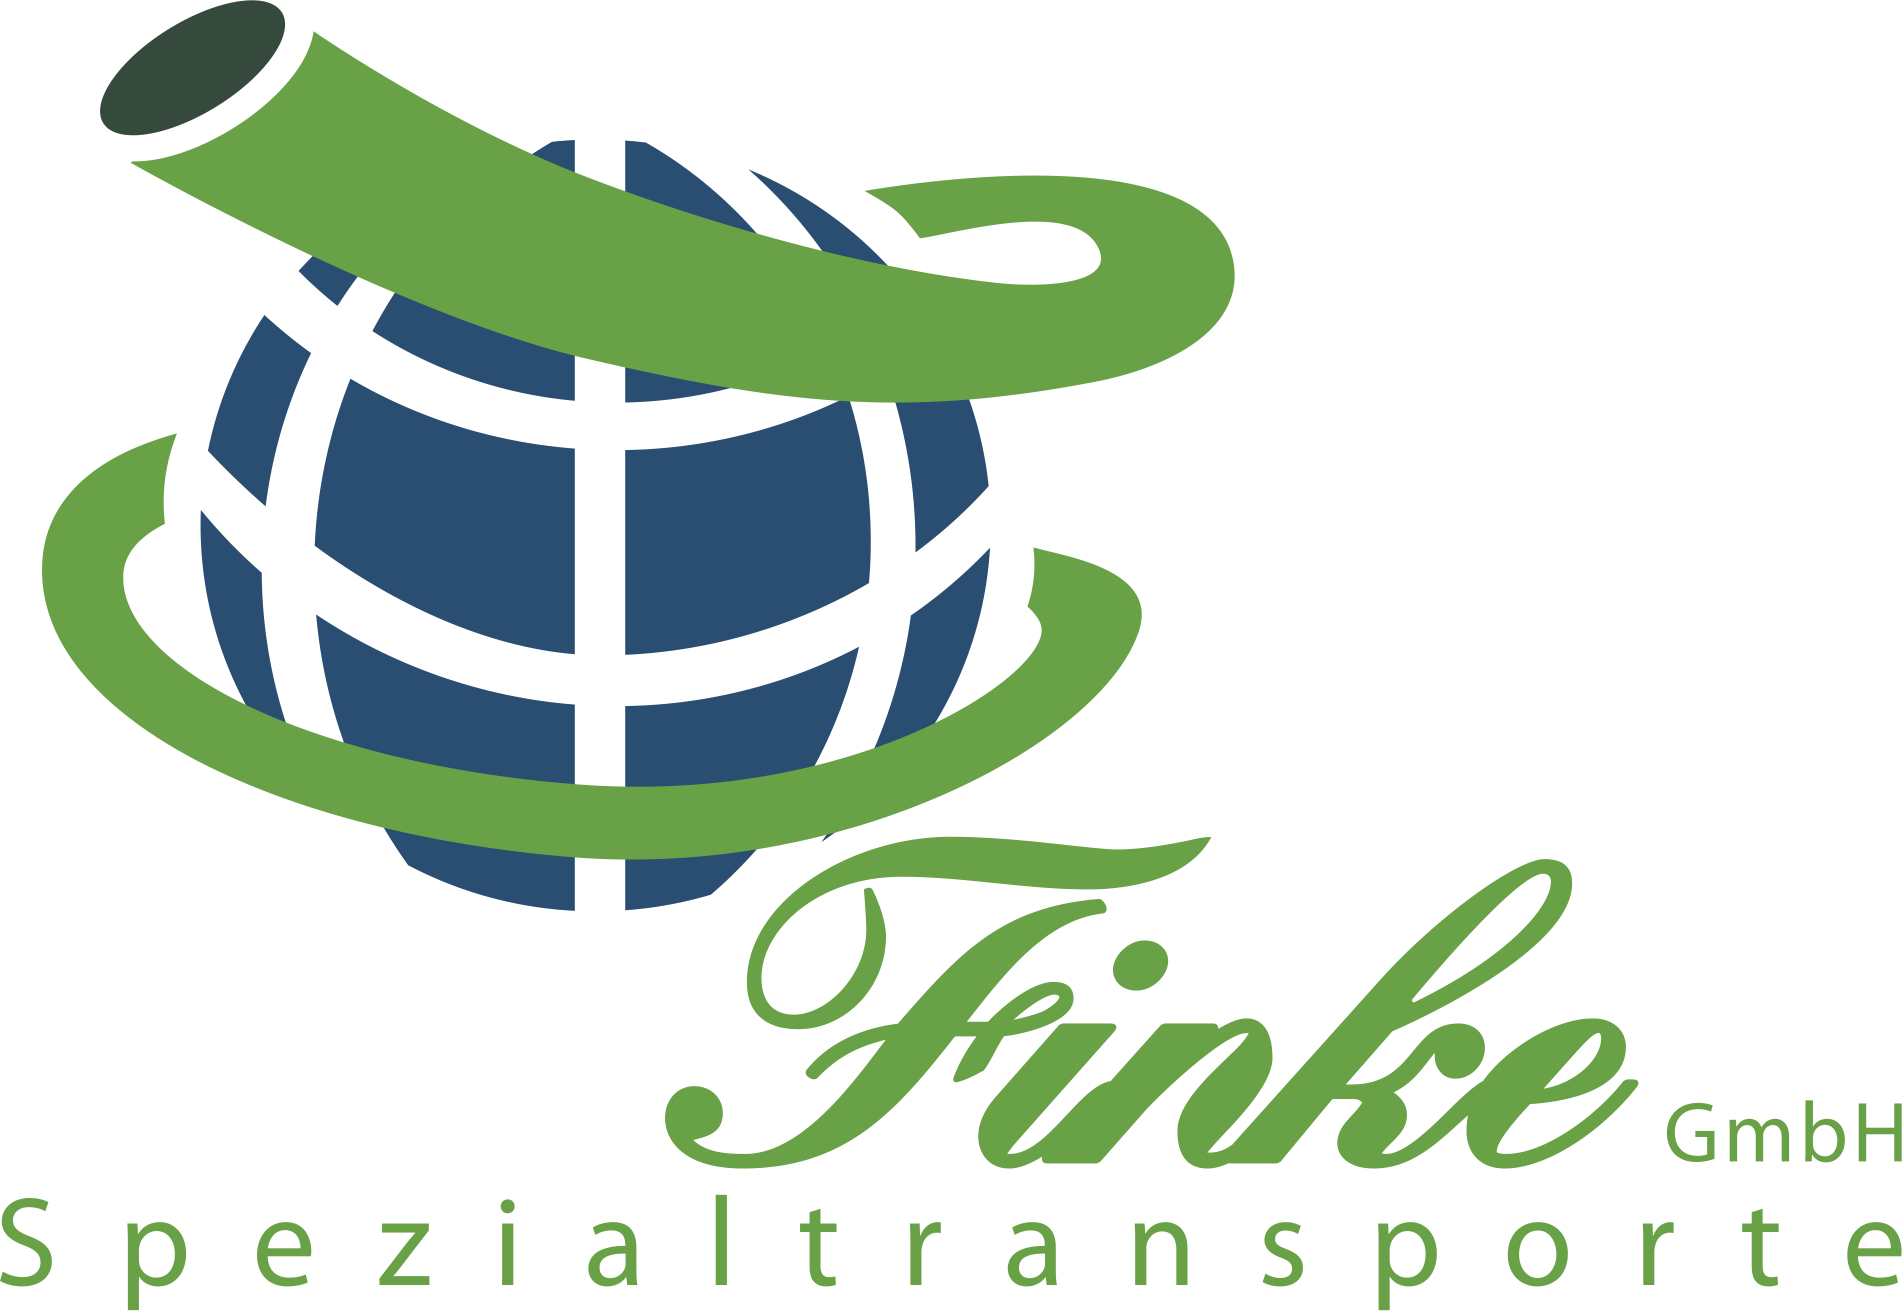 Finke Spezialtransporte